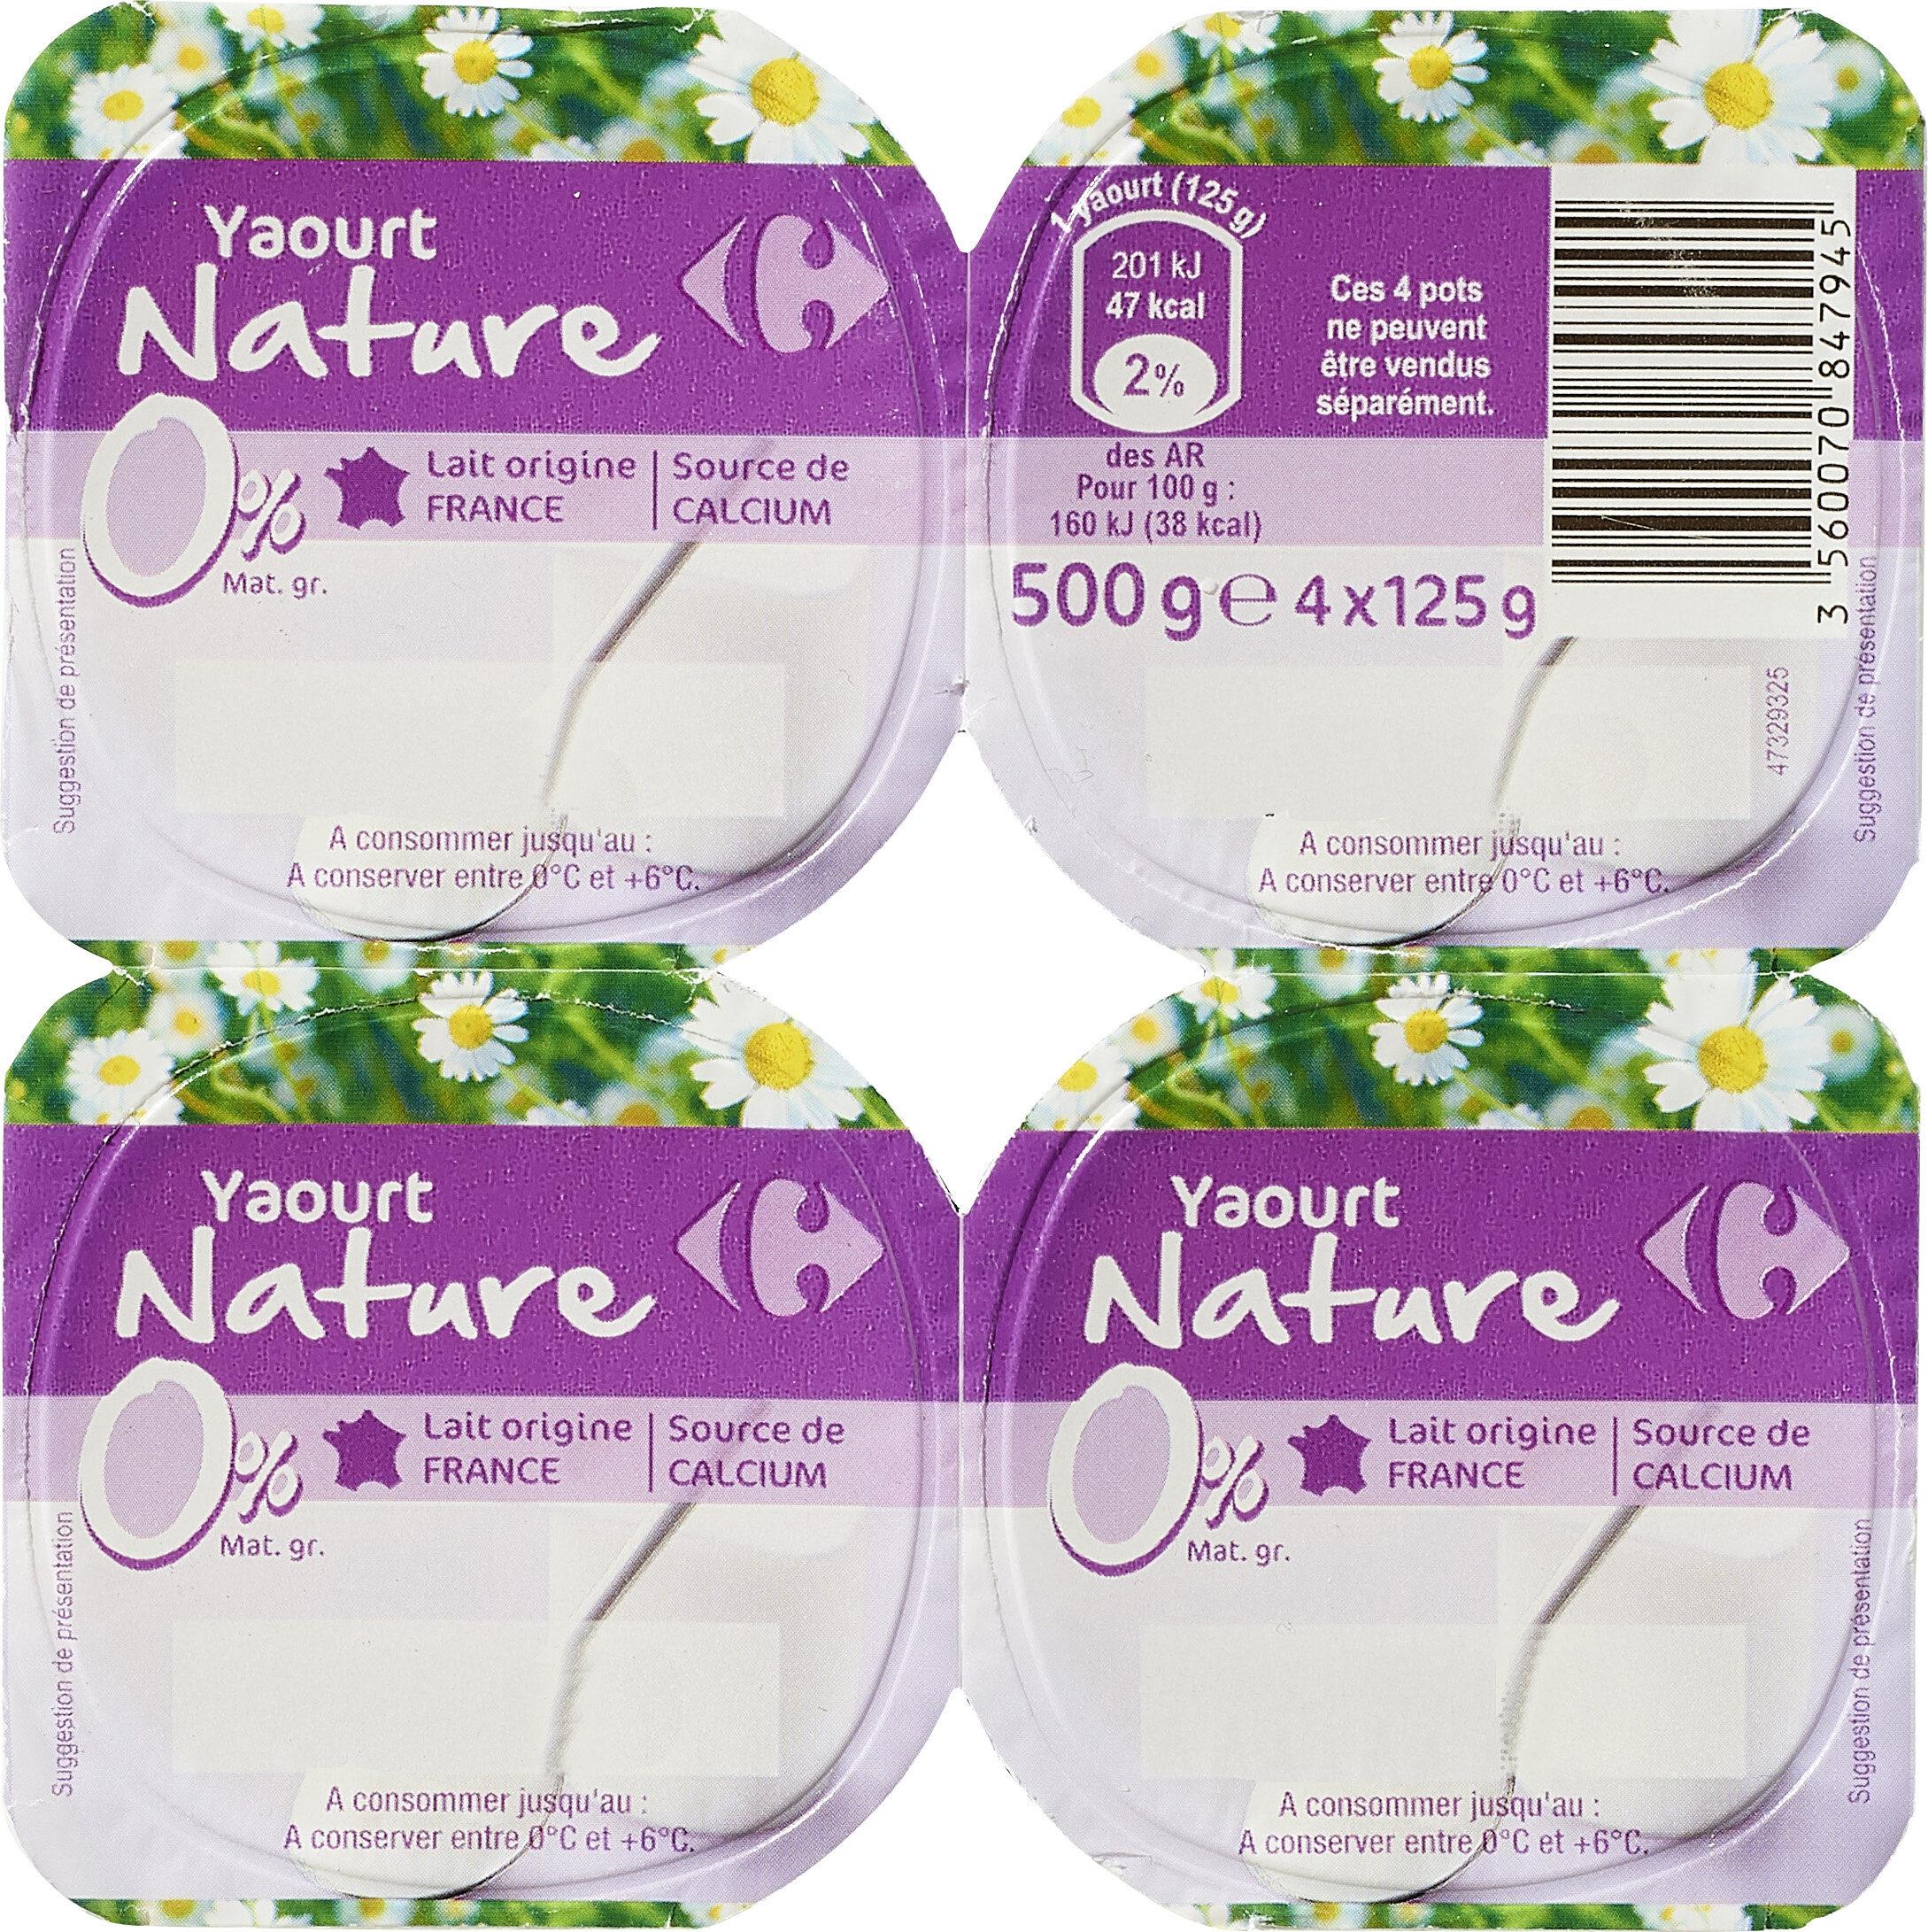 Yaourt nature 0% - Product - fr